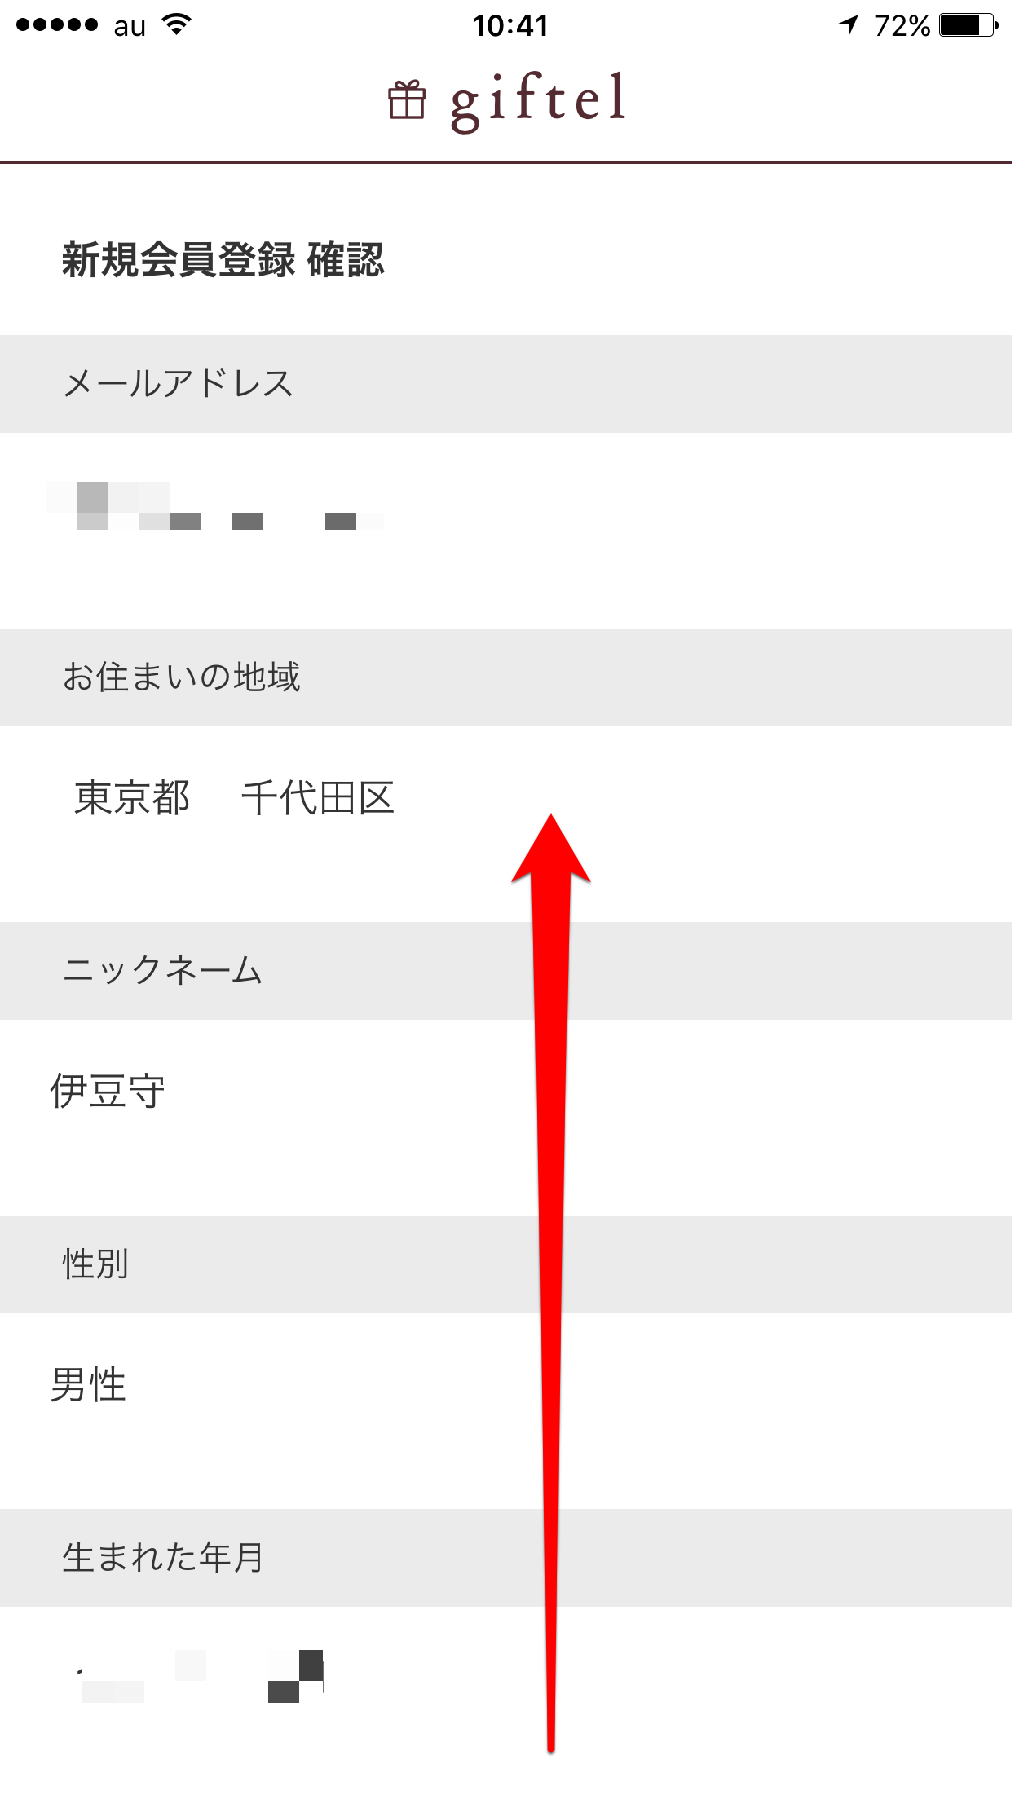 giftelの会員登録情報の確認画面